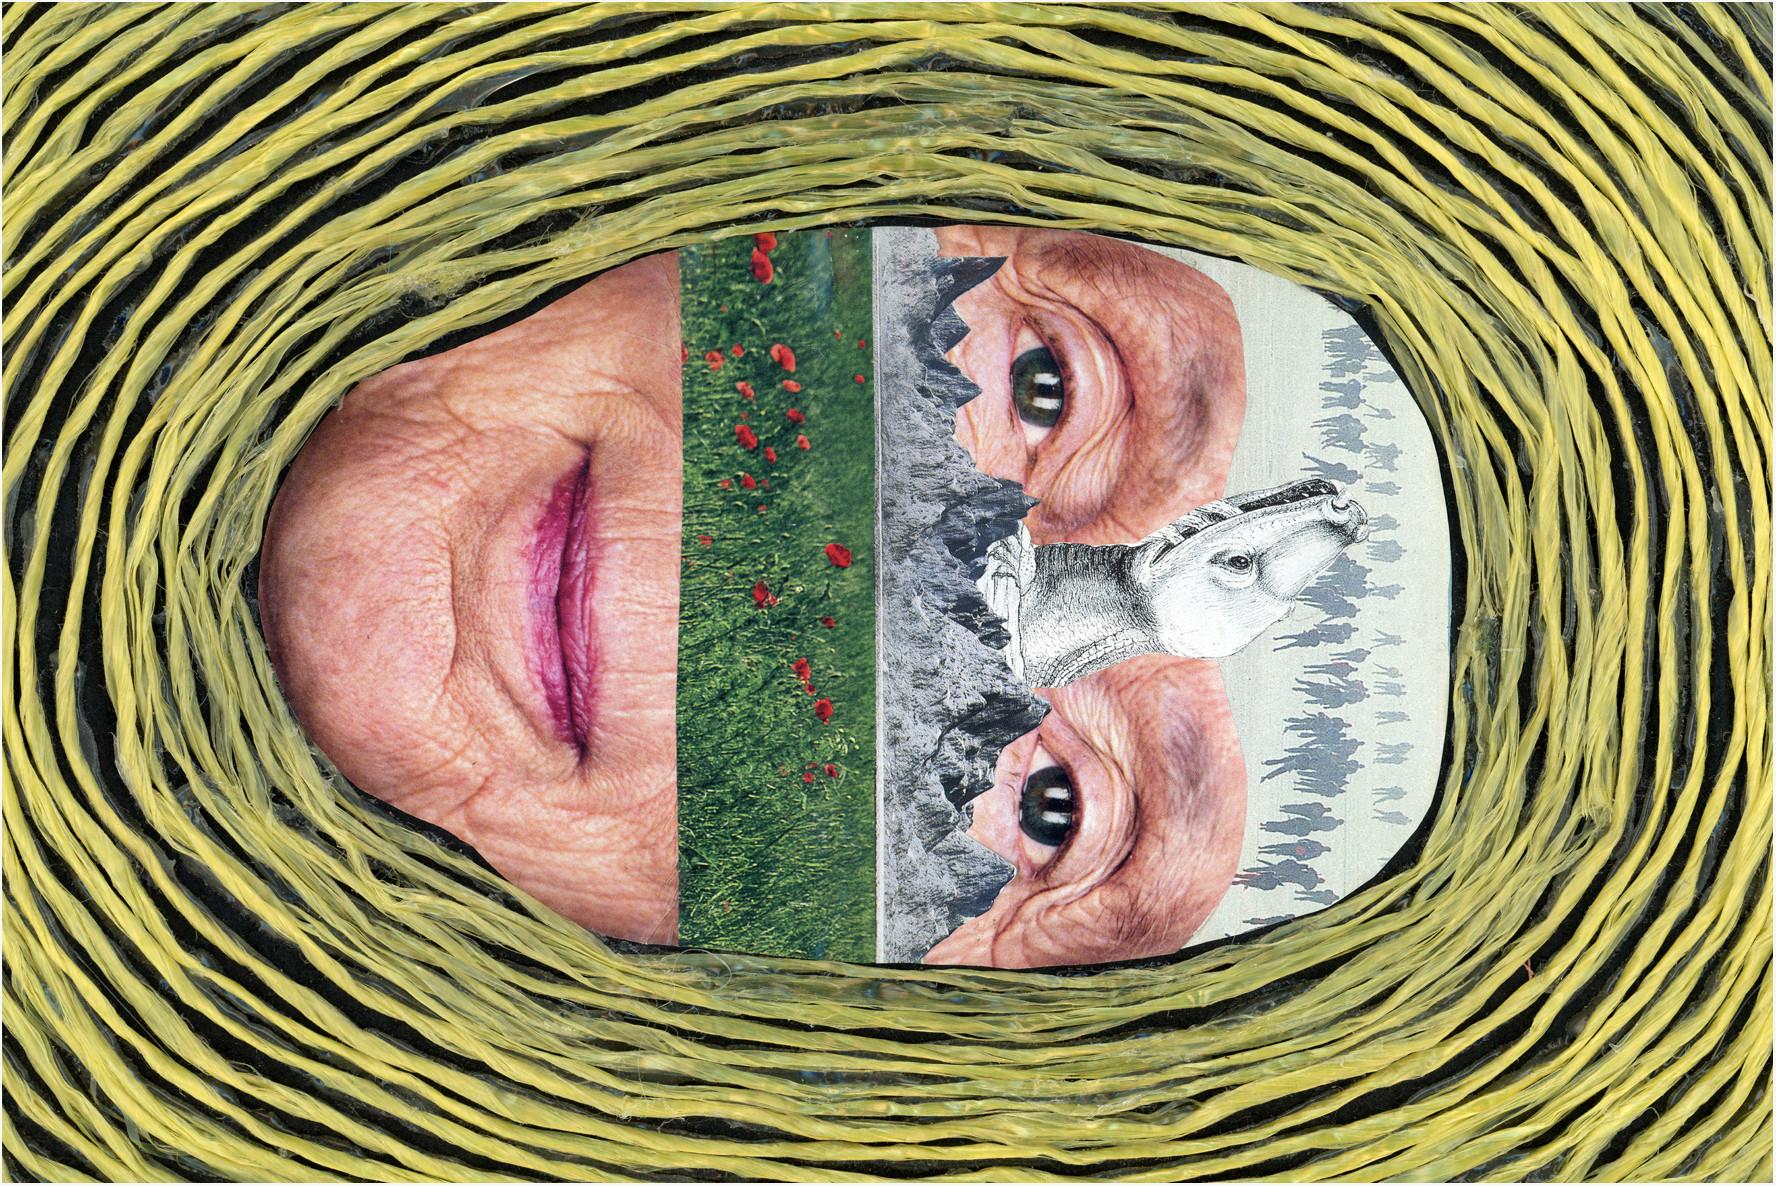 Abuela adentro - Rosita de Aguirre